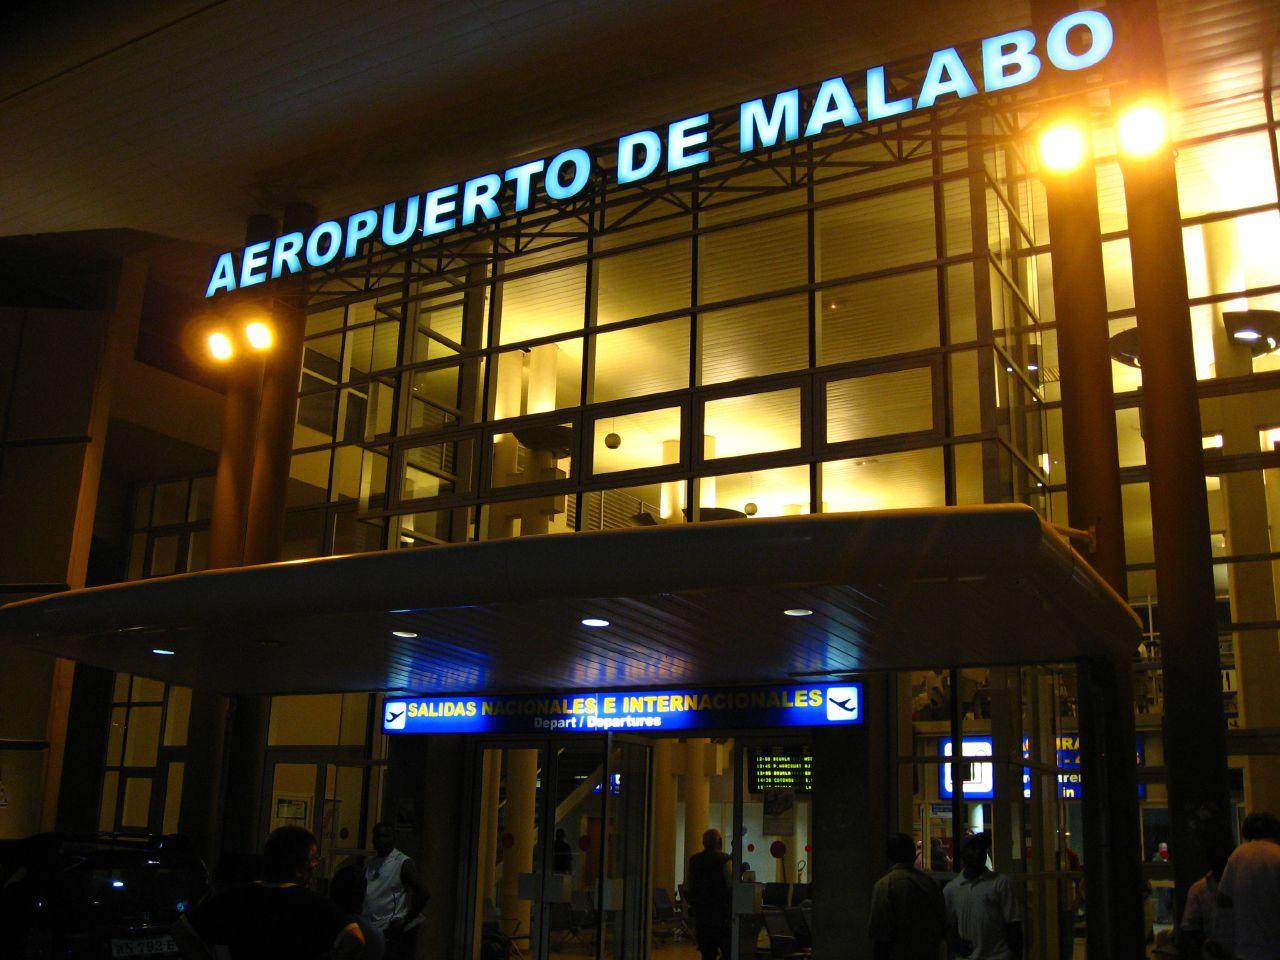 Aeropuerto_Malabo